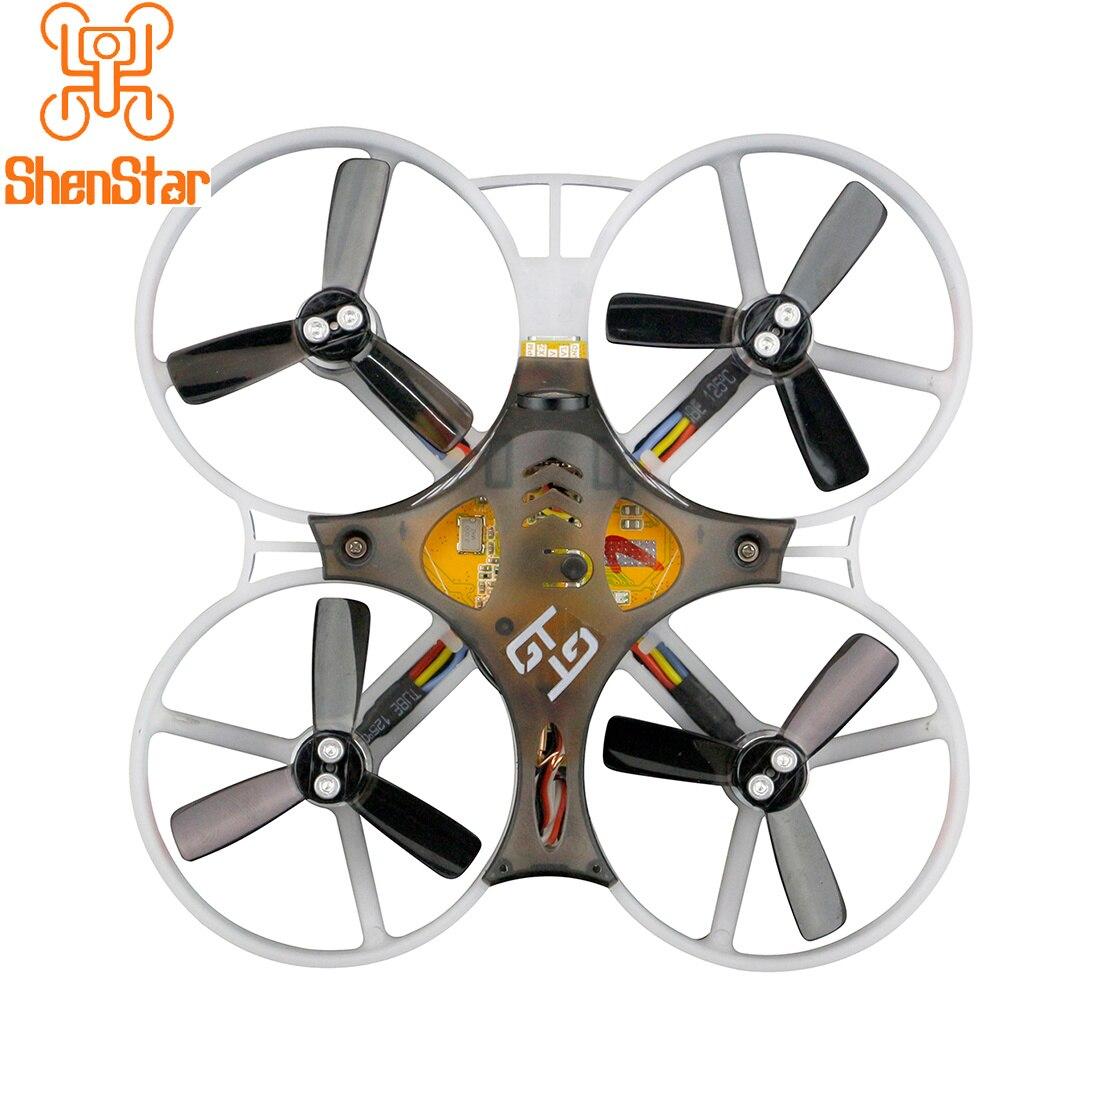 2S Power TINY GT7 75mm Wheelbase Ting Whoop Drone Mini Quadcopter Betaflight SPRACINGF3 10A BLHeli 800TVL Cam BNF Accessories man ting